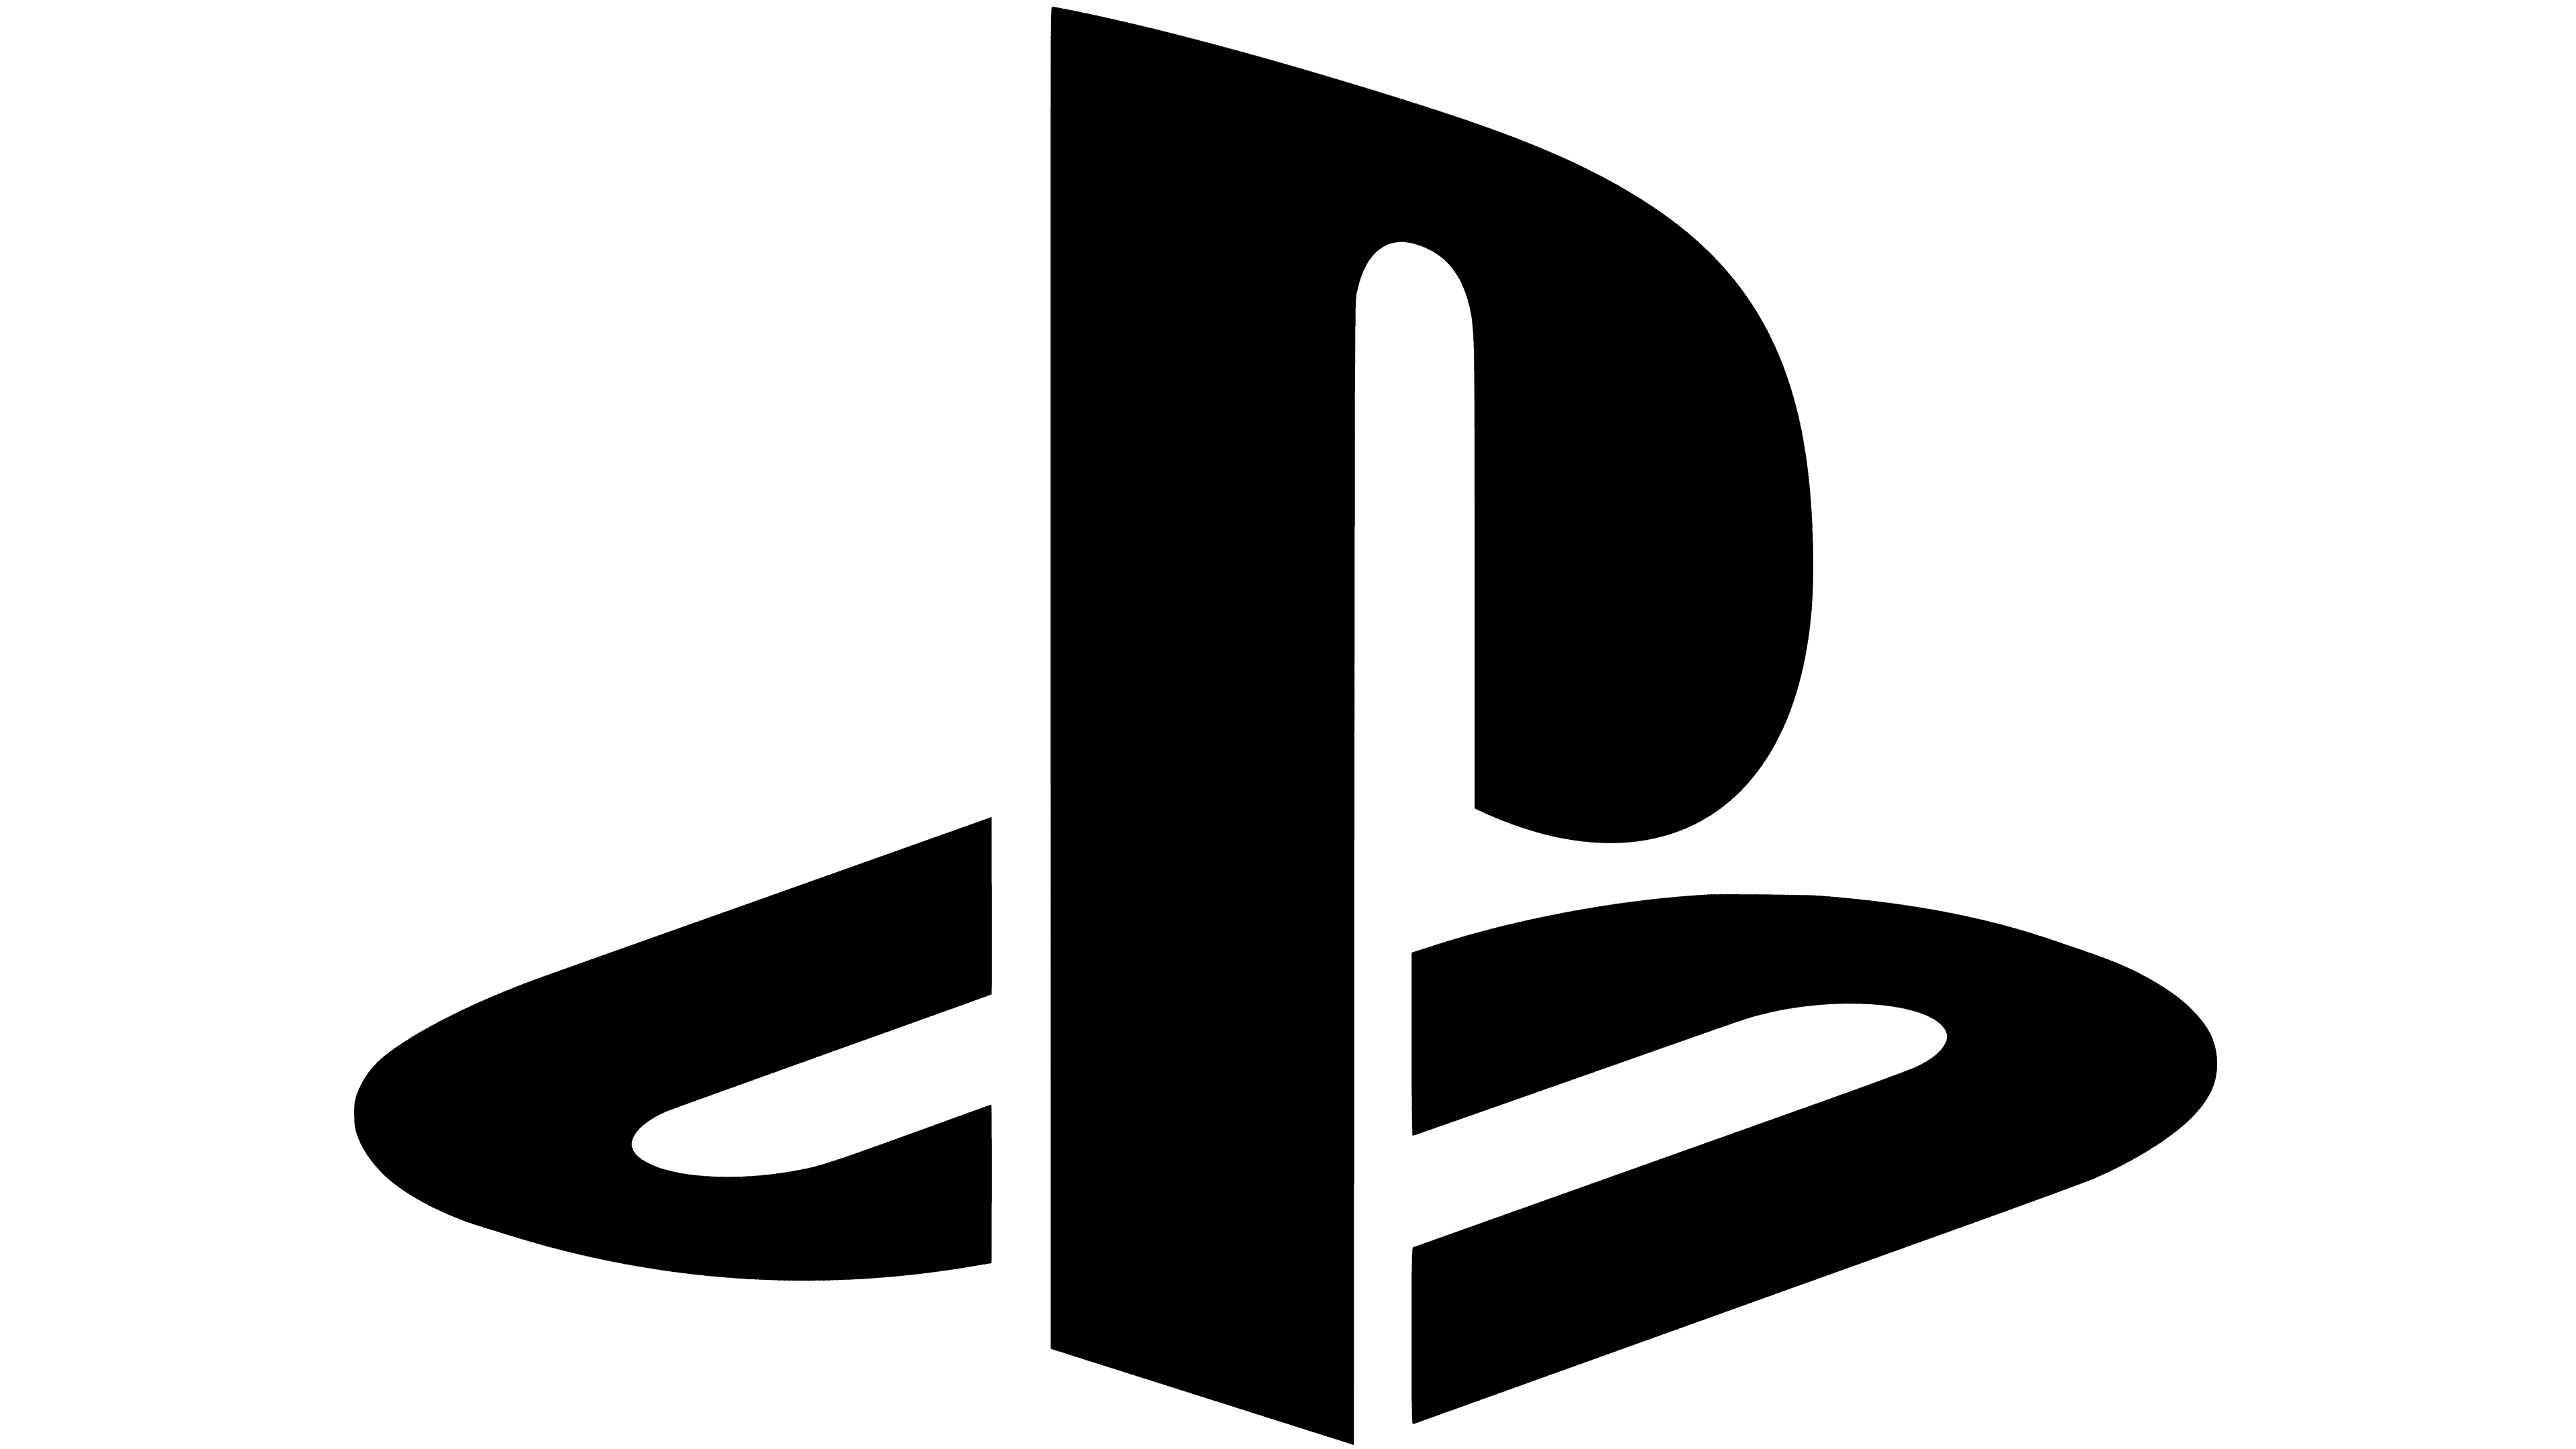 Playstation Logo Logo